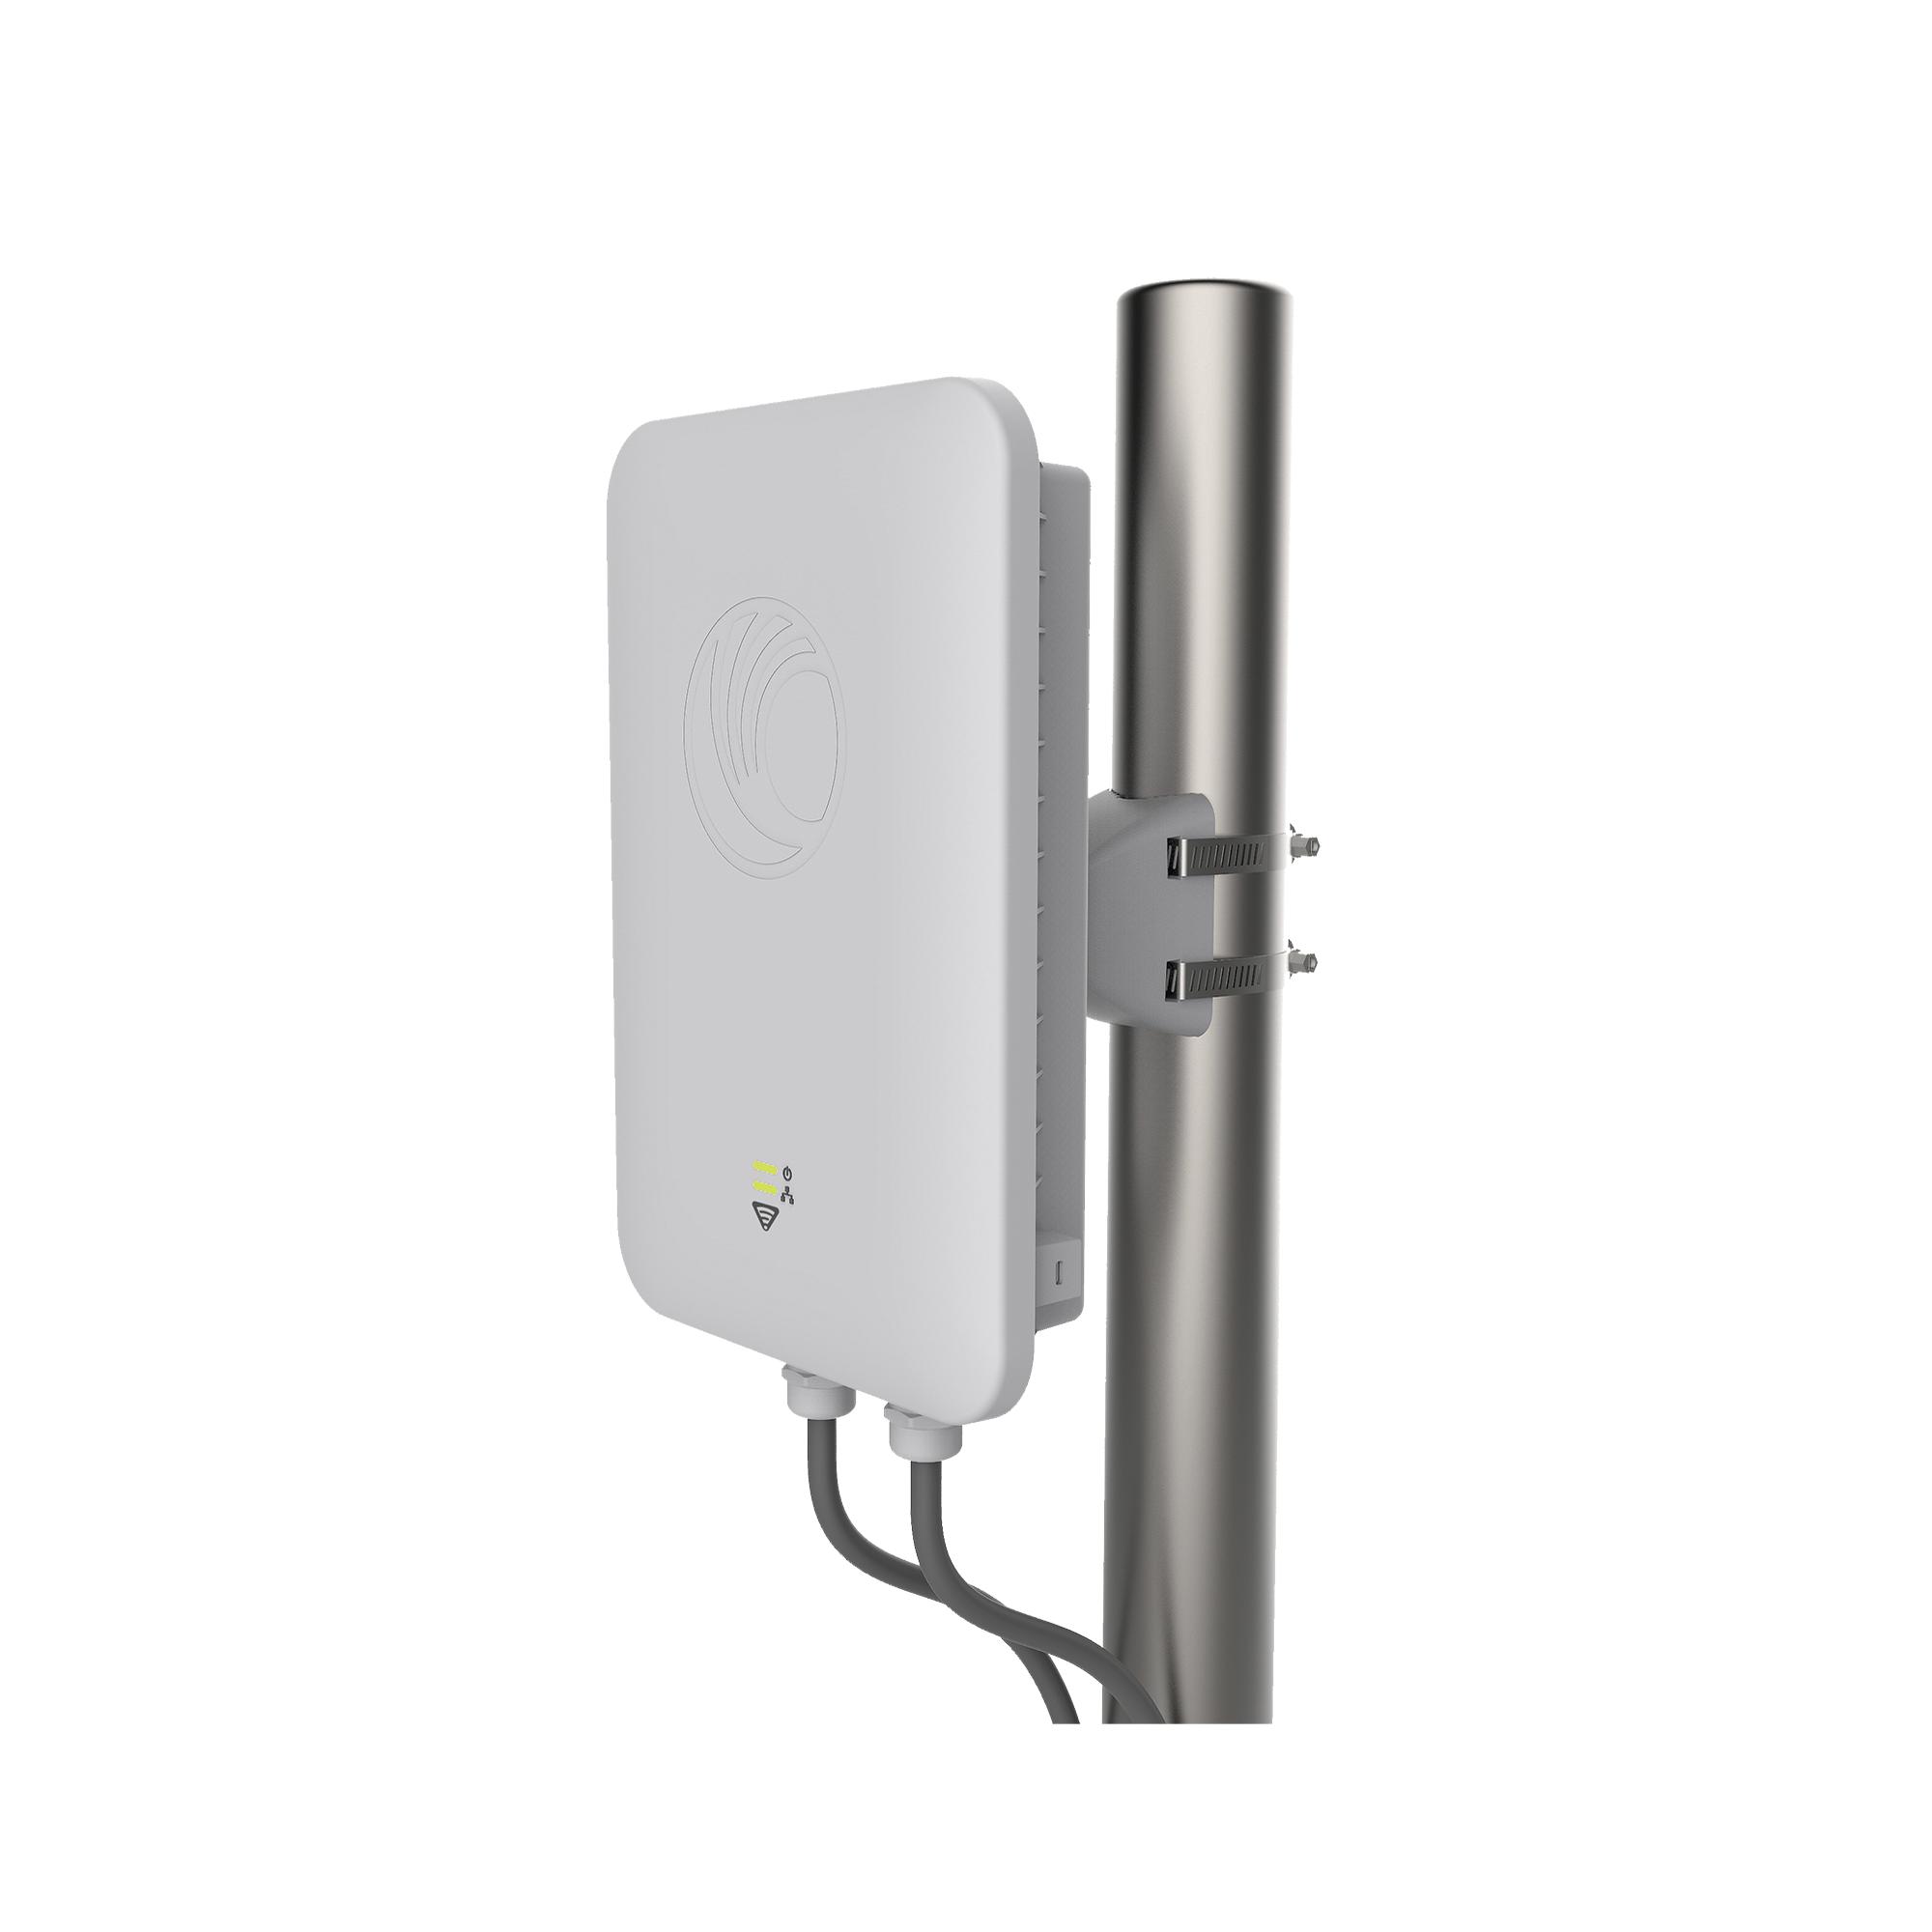 Access Point WiFi Industrial cnPilot e500 de alta capacidad para exterior, IP67, doble banda, antena de 30? y puerto PoE secundario (PL-E500USCA-RW)